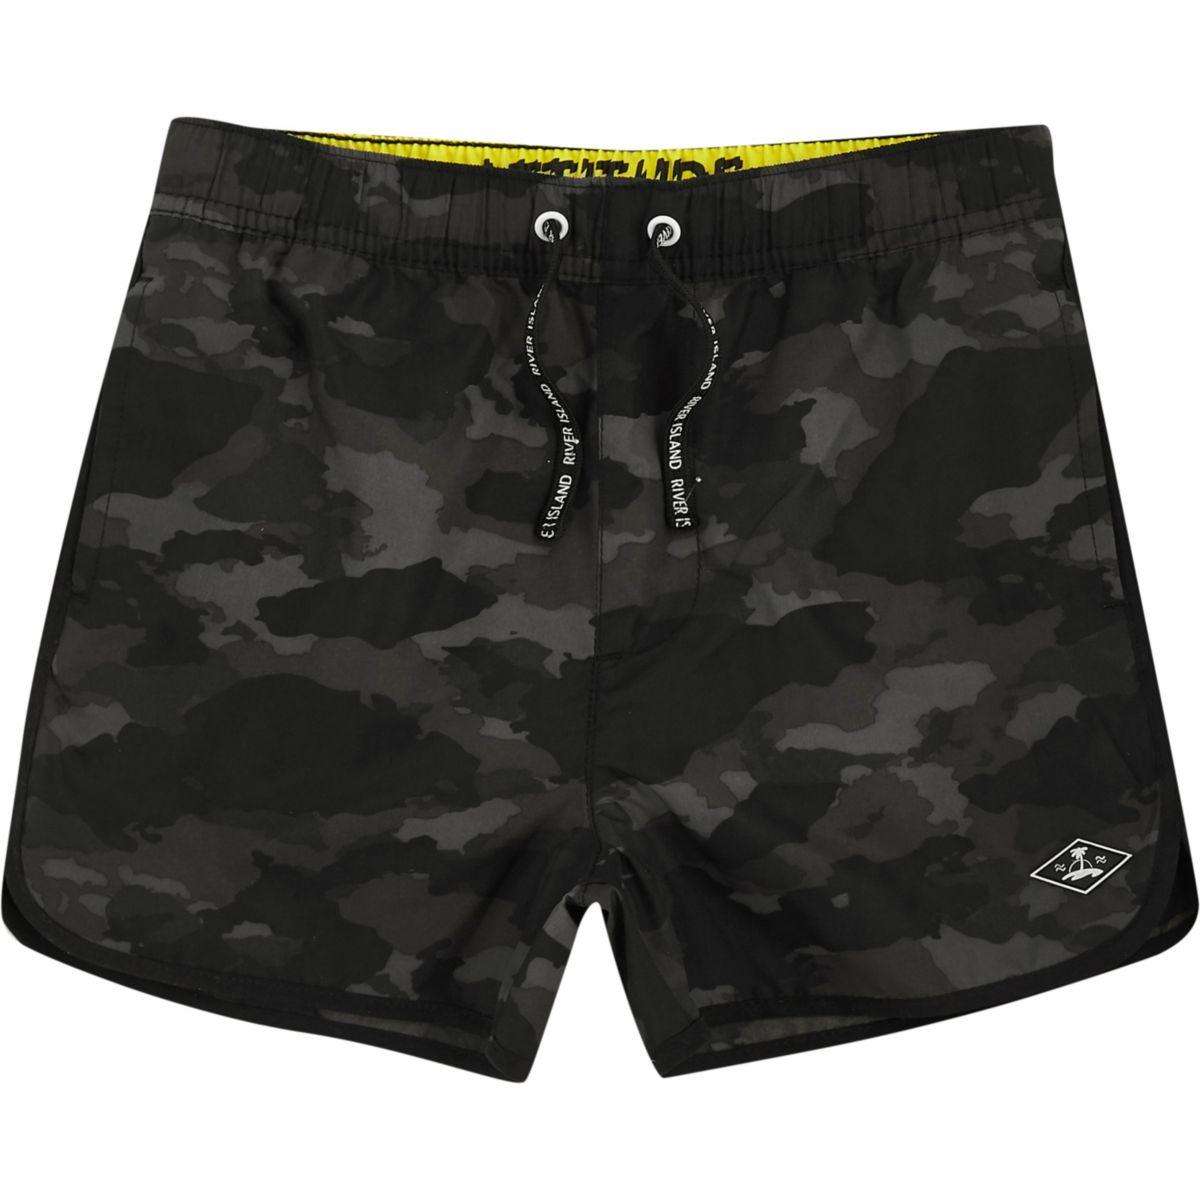 Boys khaki print swim trunks